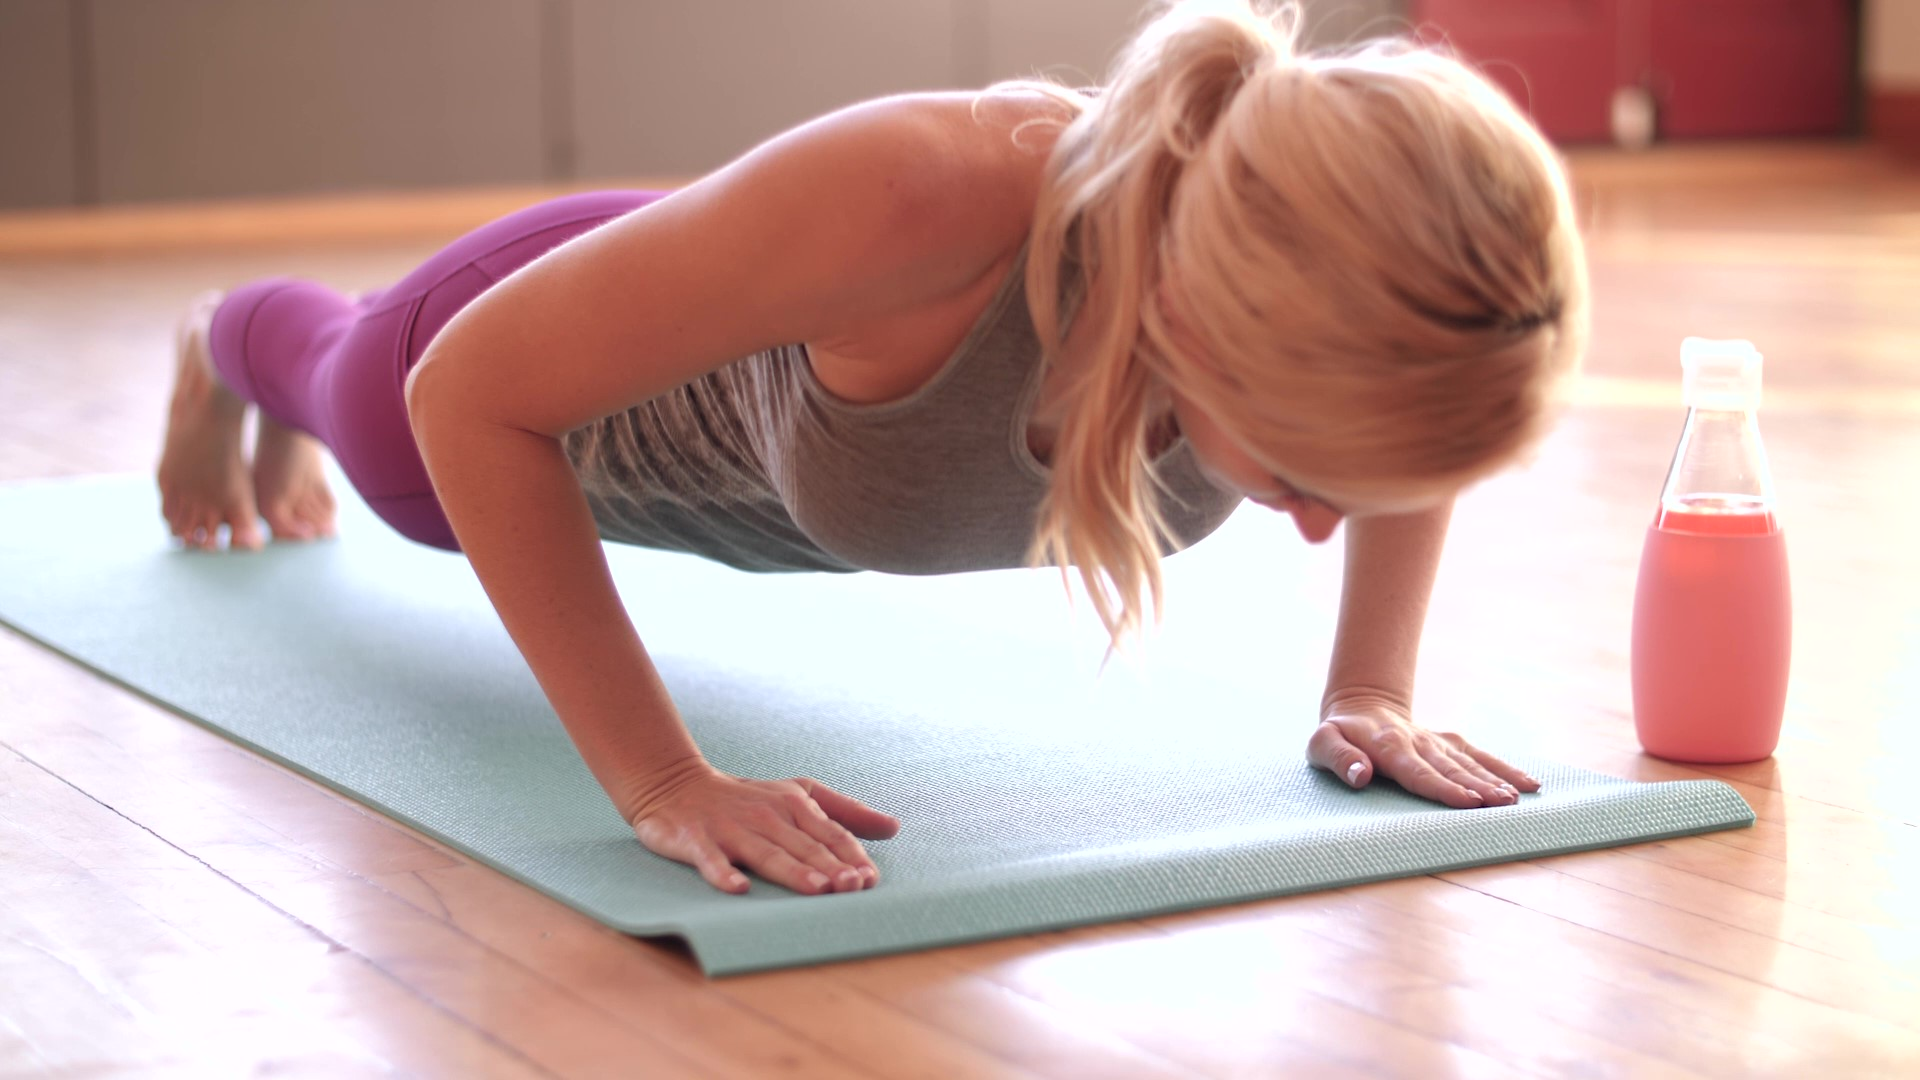 Adding Fashion to the Yoga Studio